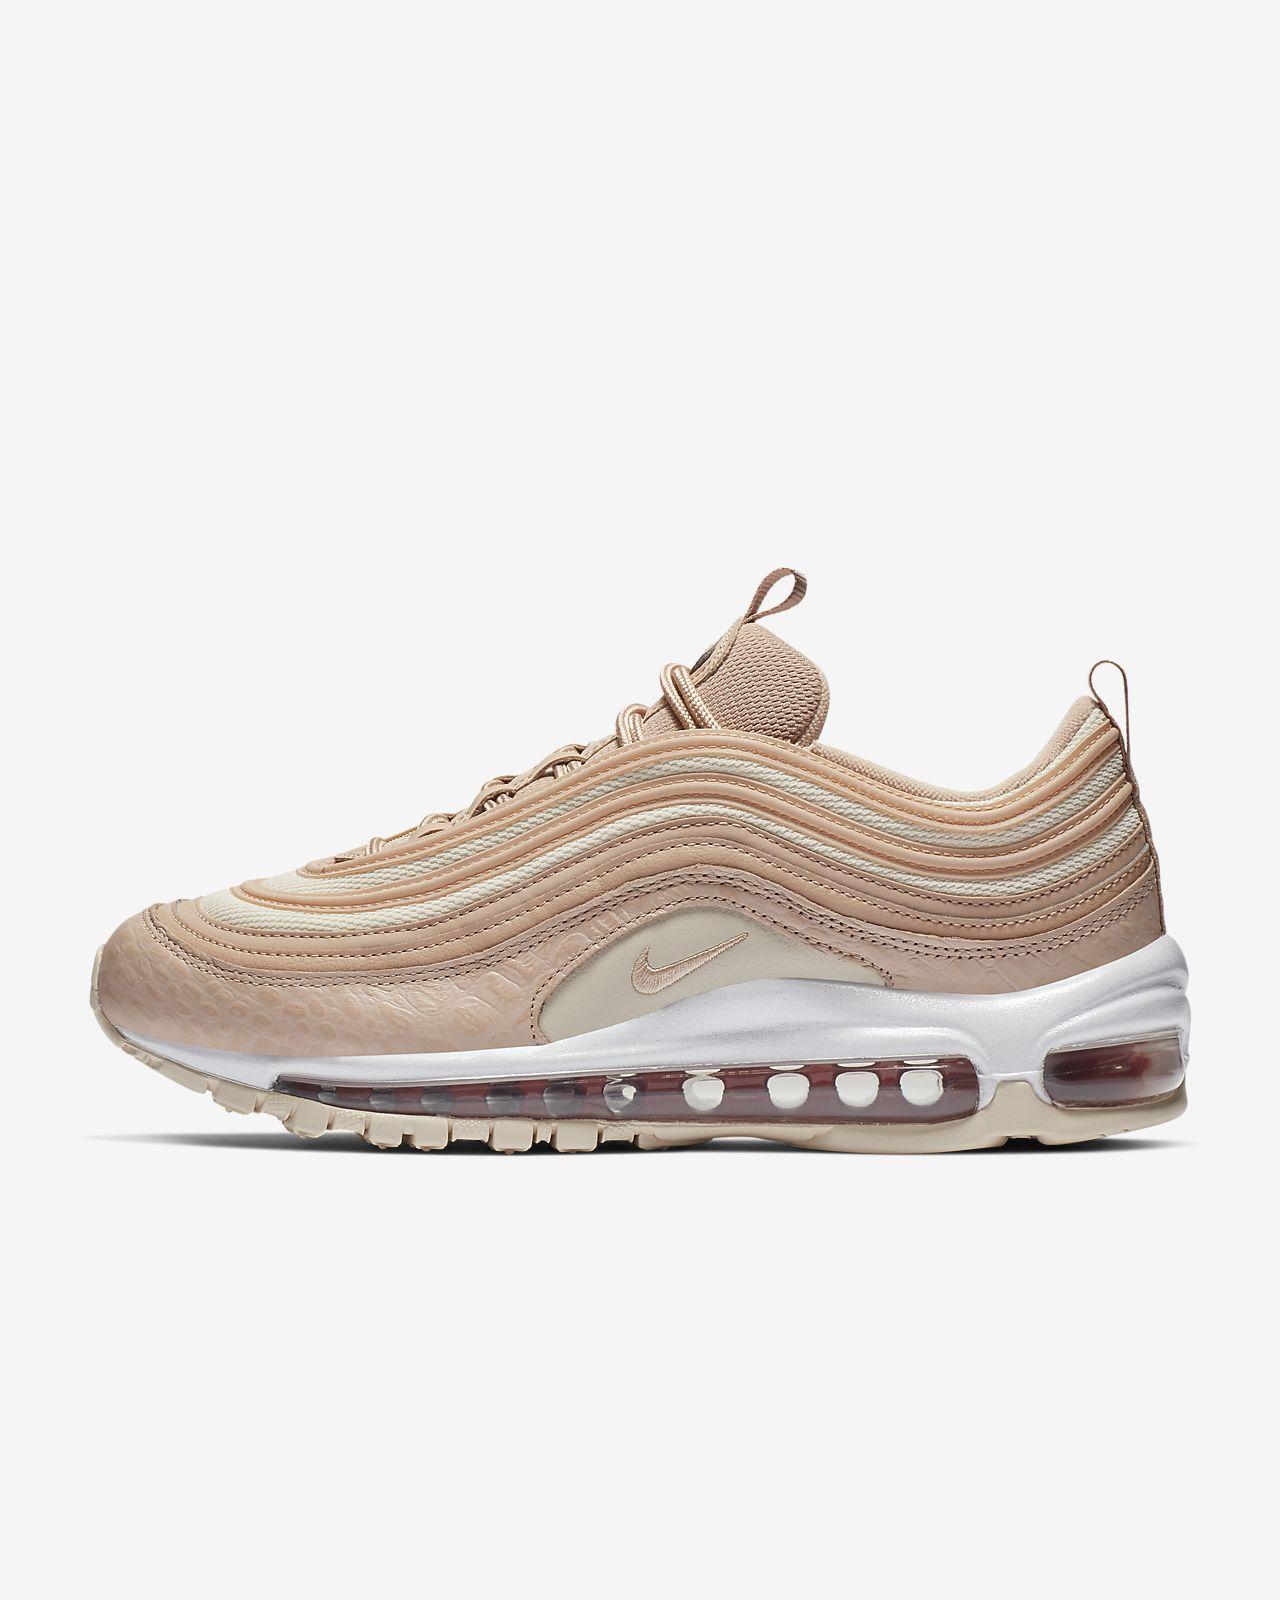 arrives 4d0be d1aa8 ... Nike Air Max 97 LX Women s Shoe